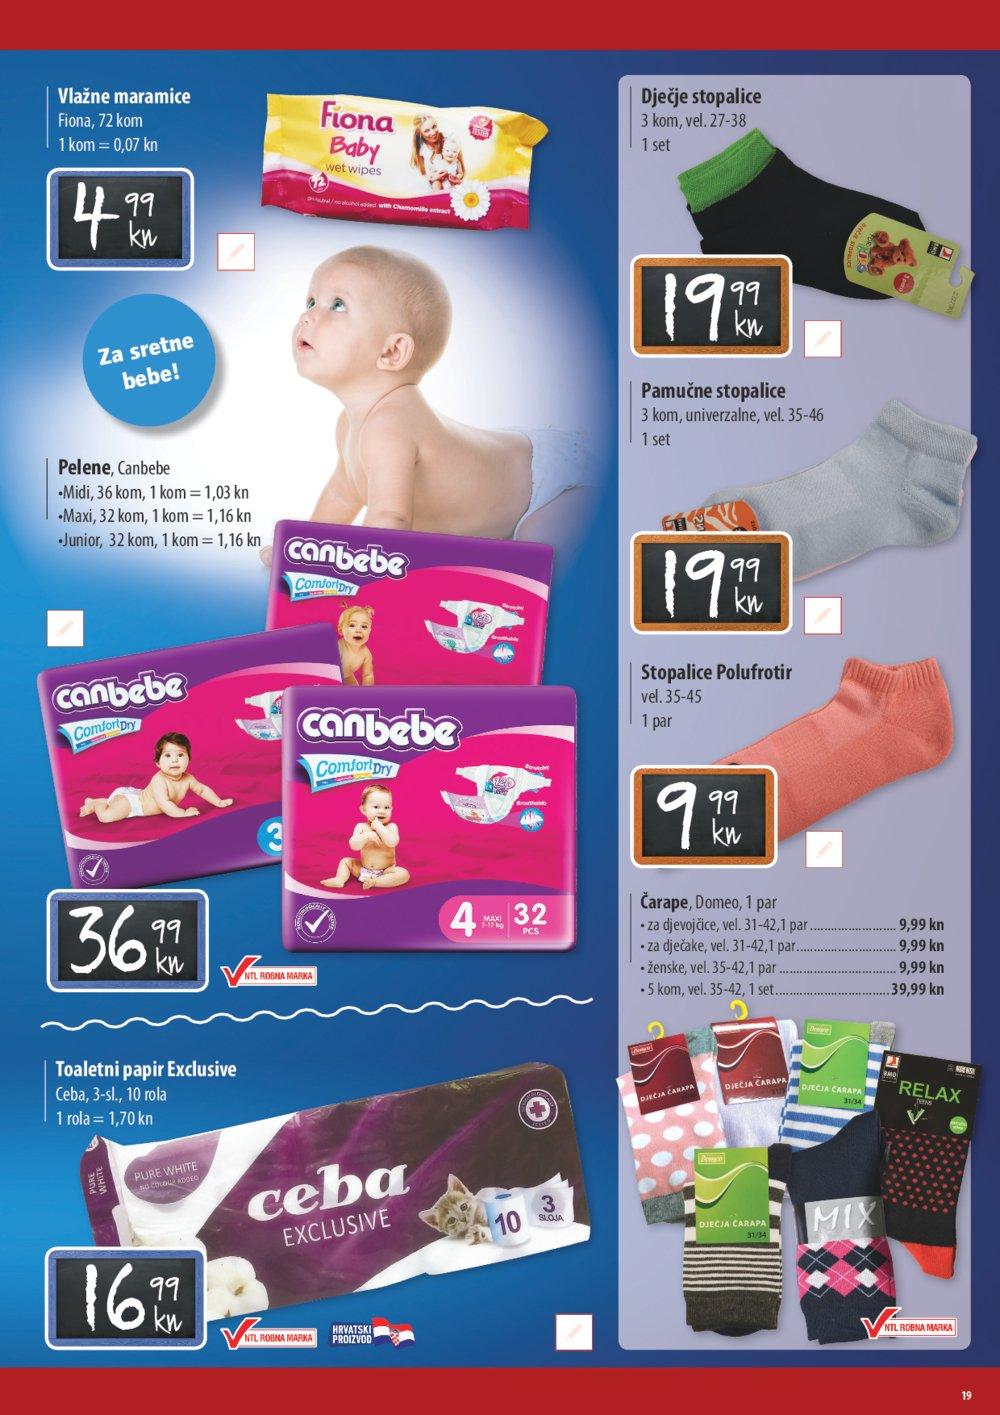 Boso katalog NTL Maxi ponuda 04.06.-10.06.2020.